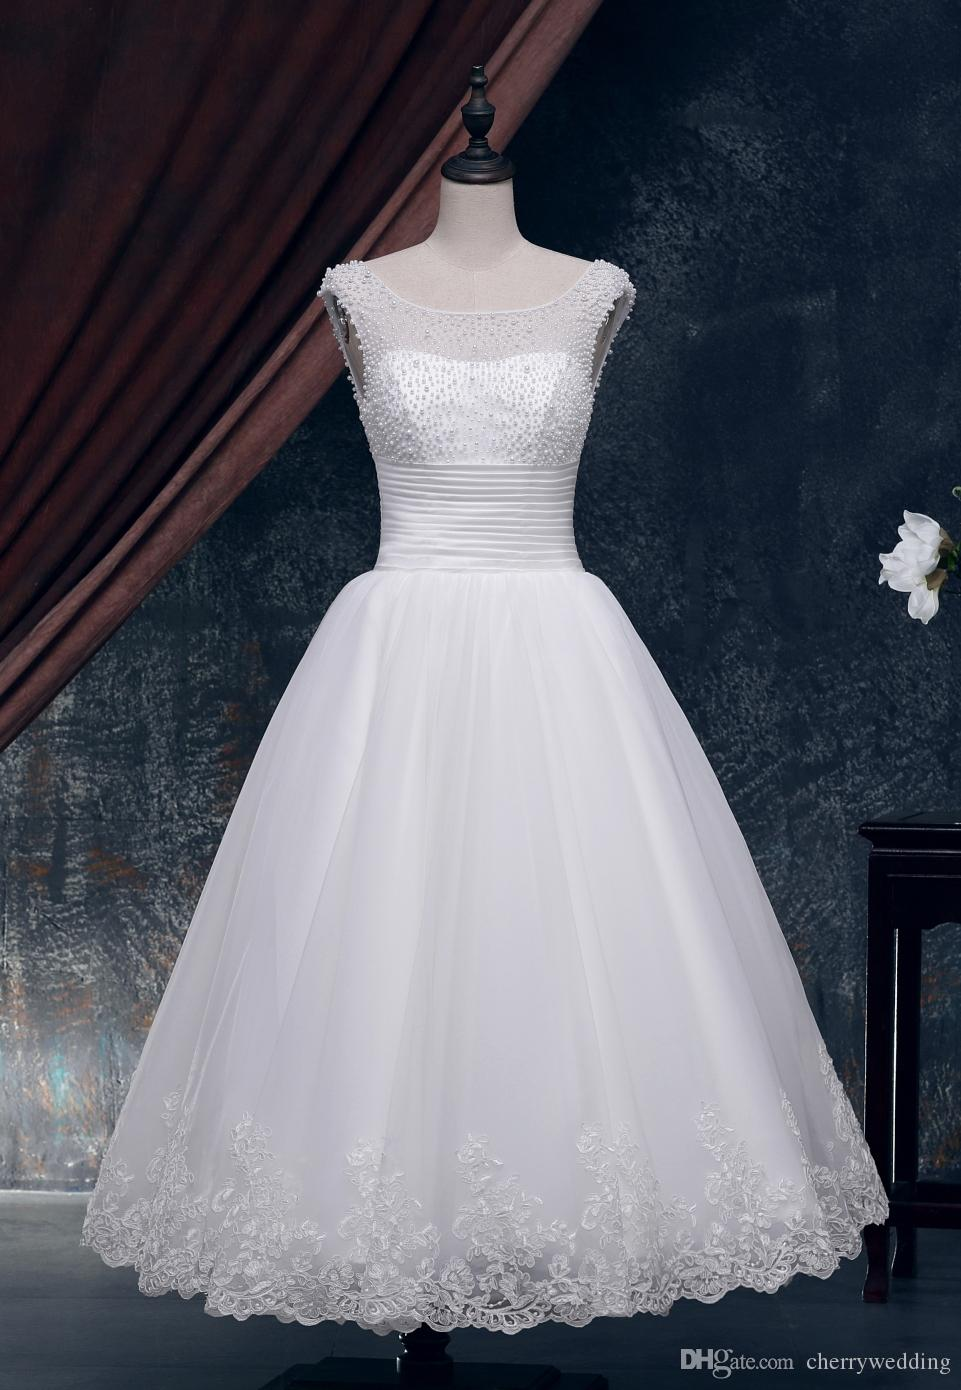 Discount Tea Length Ball Gown Wedding Dresses Vintage Wedding Dress ...